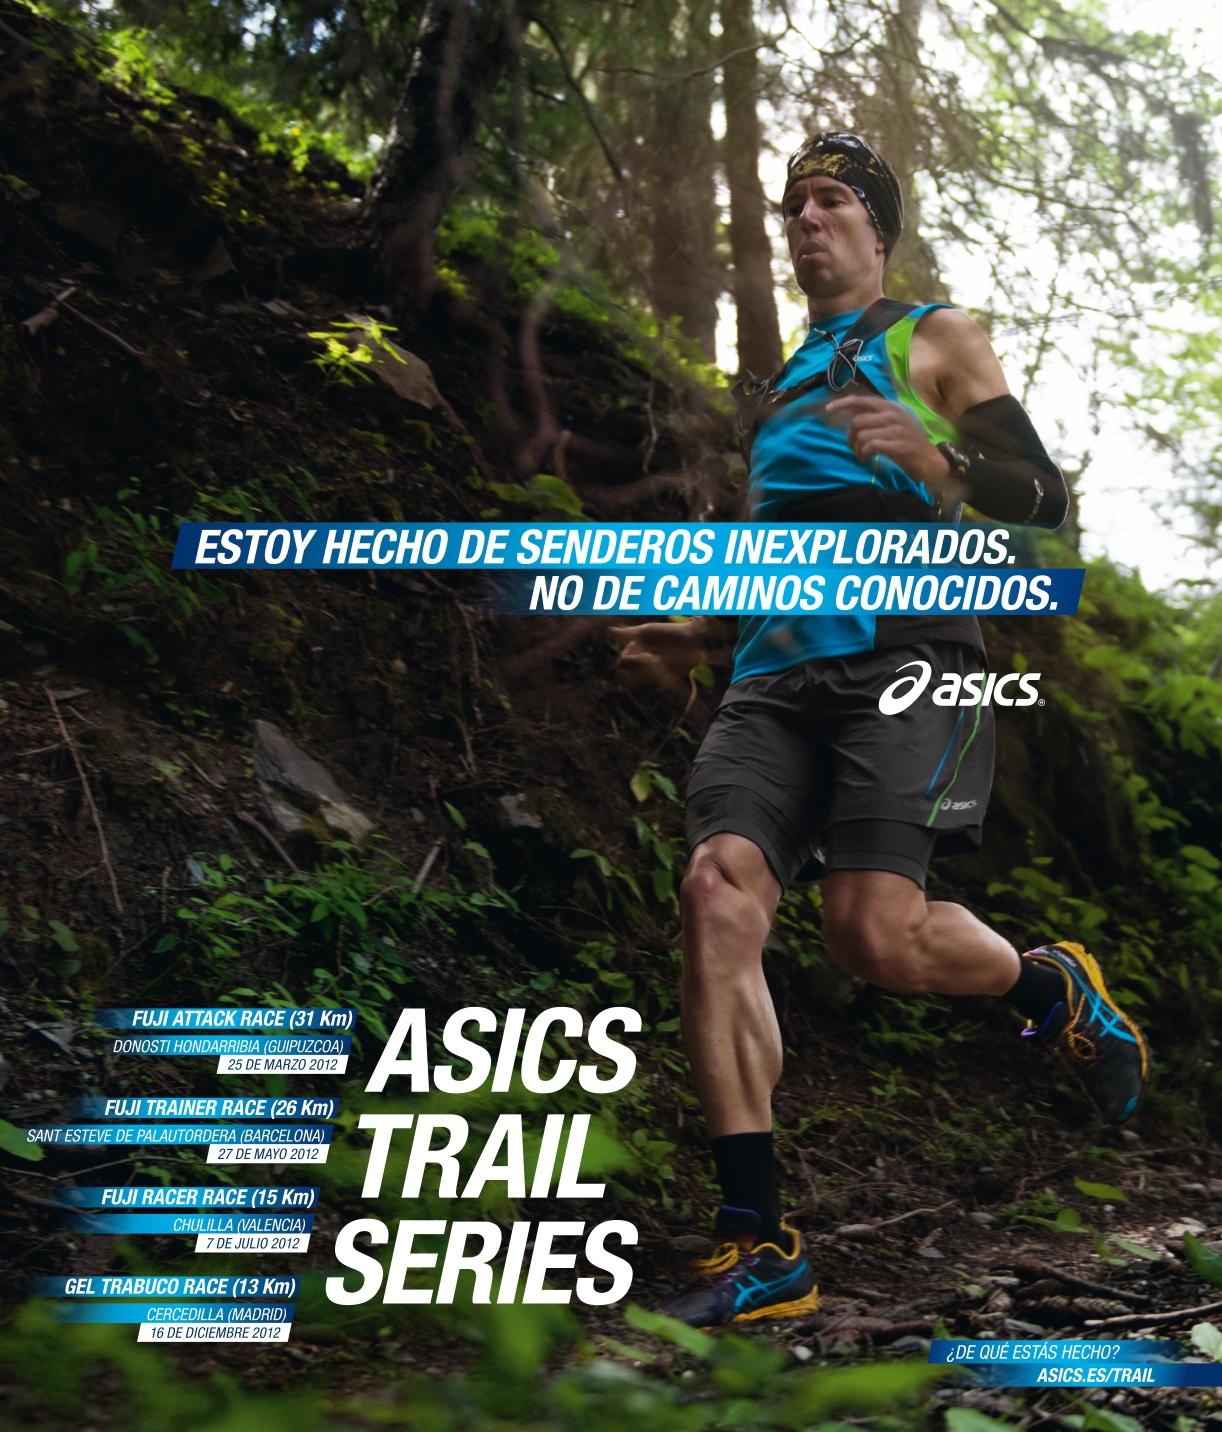 Asics Trail Series 2012